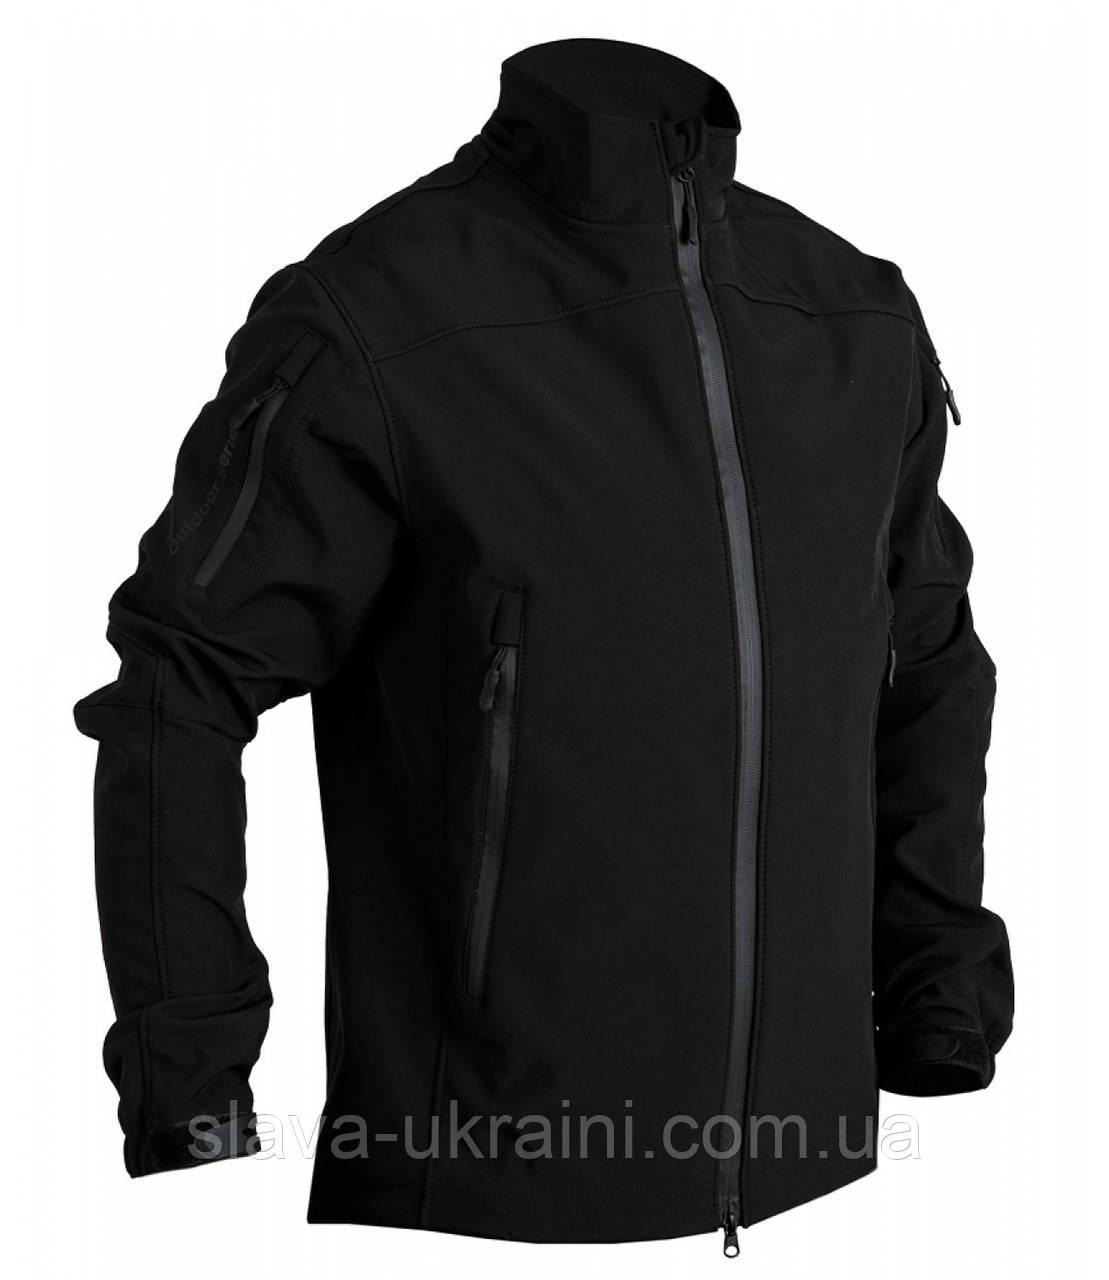 Куртка Chameleon Soft Shell Intruder Black